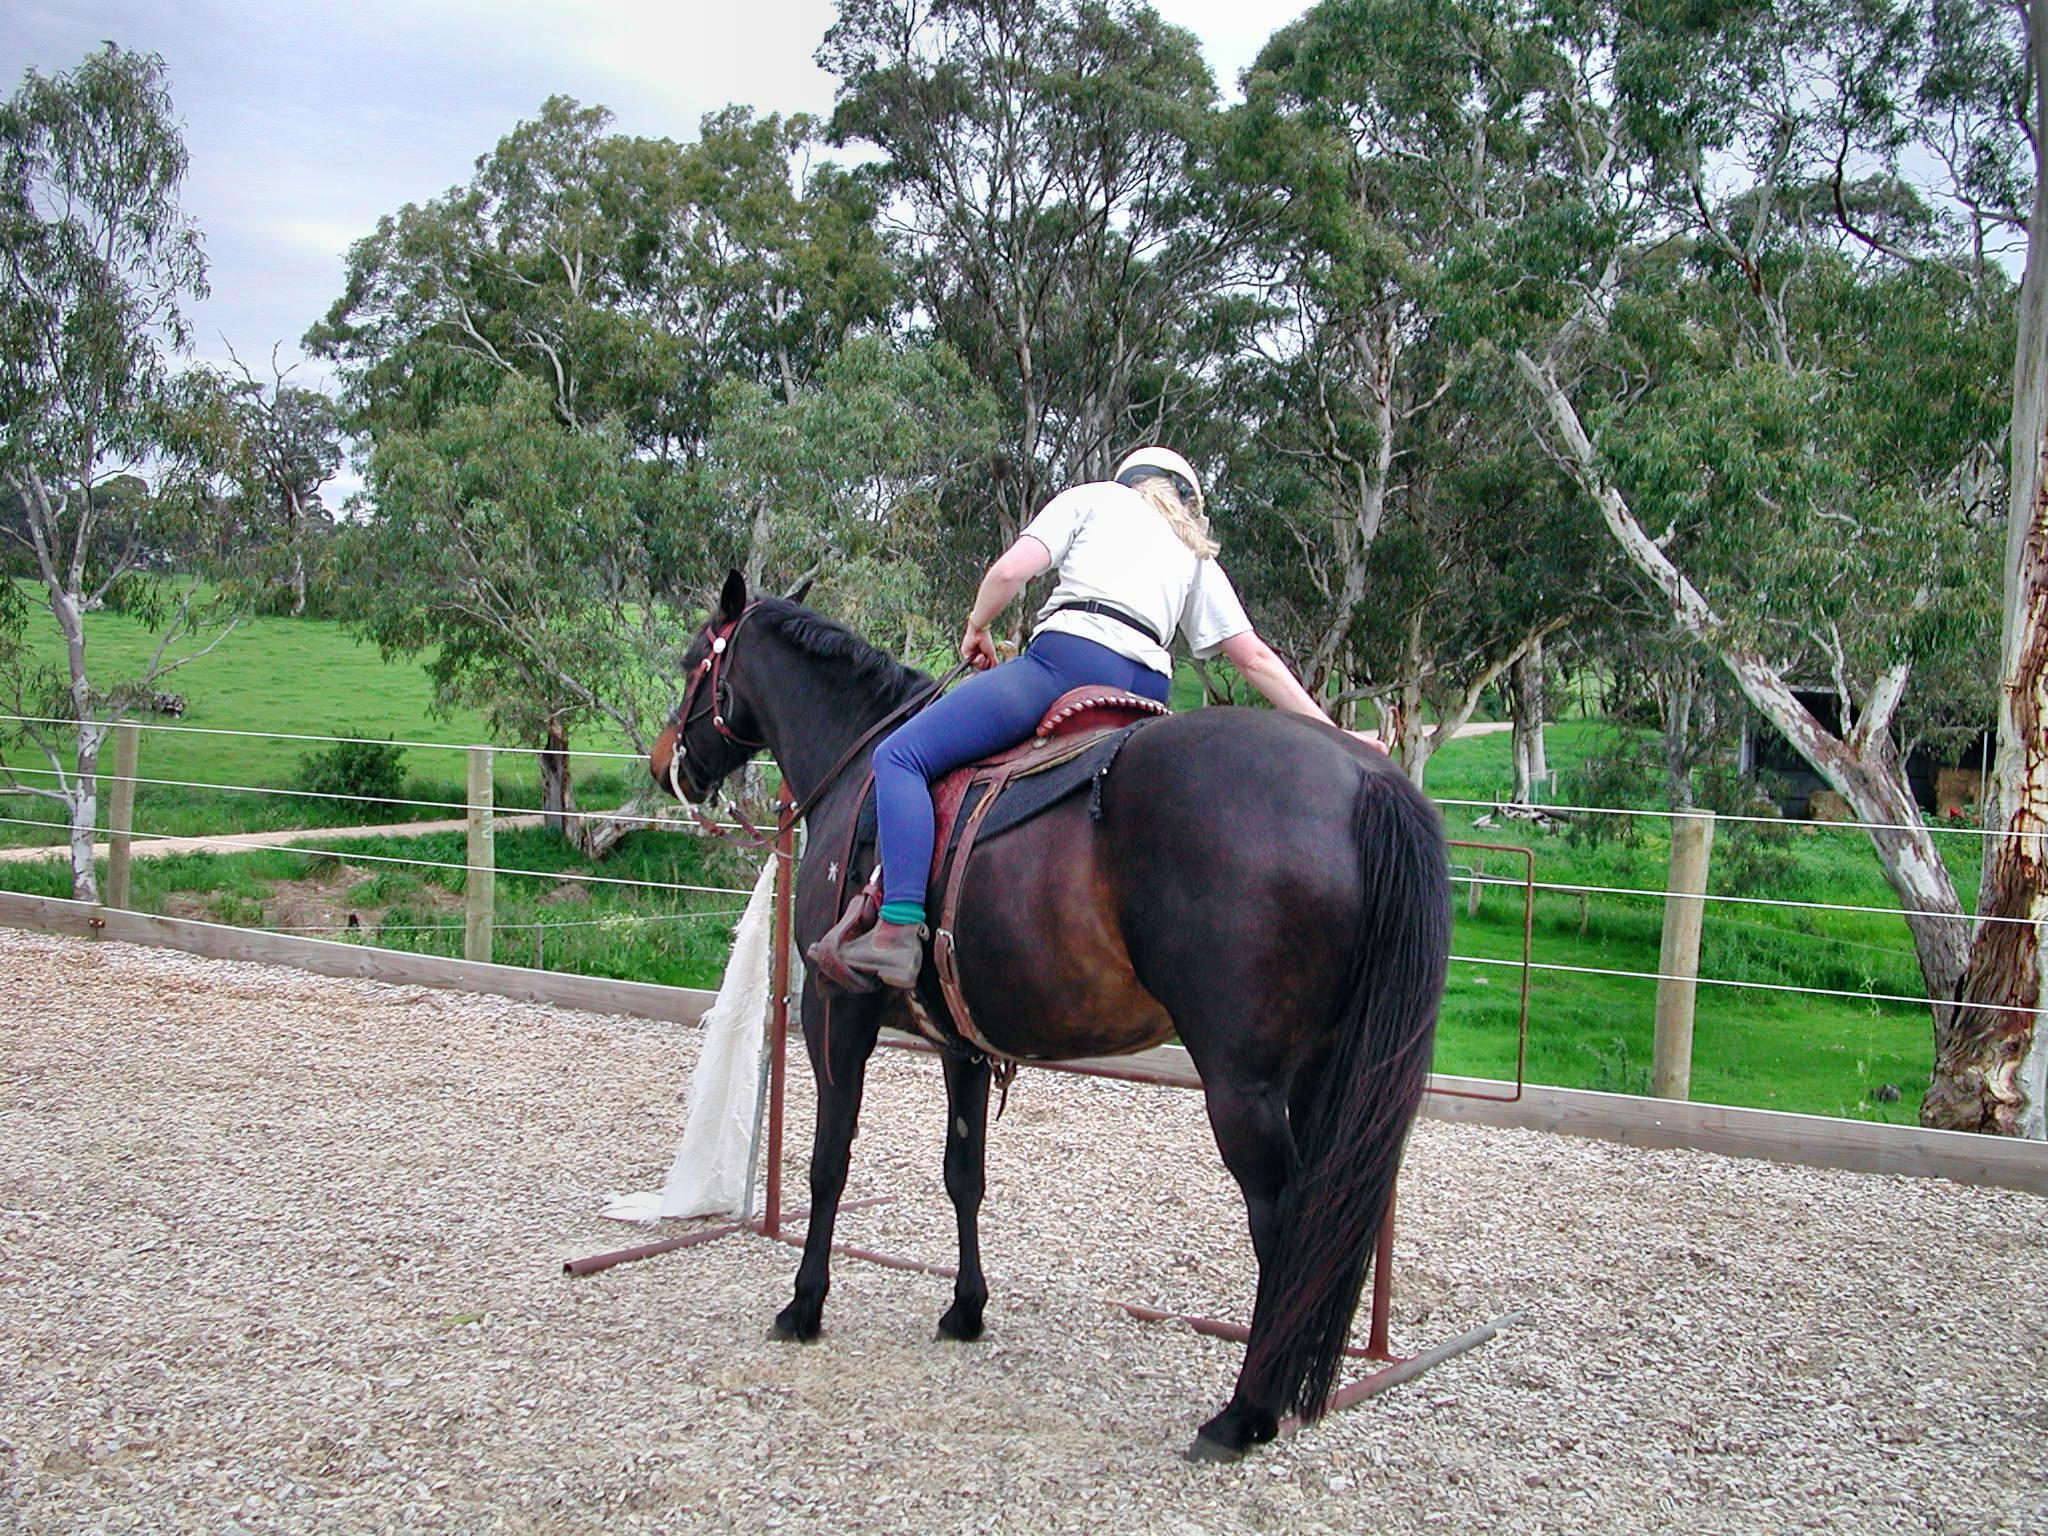 Horses-46.jpeg